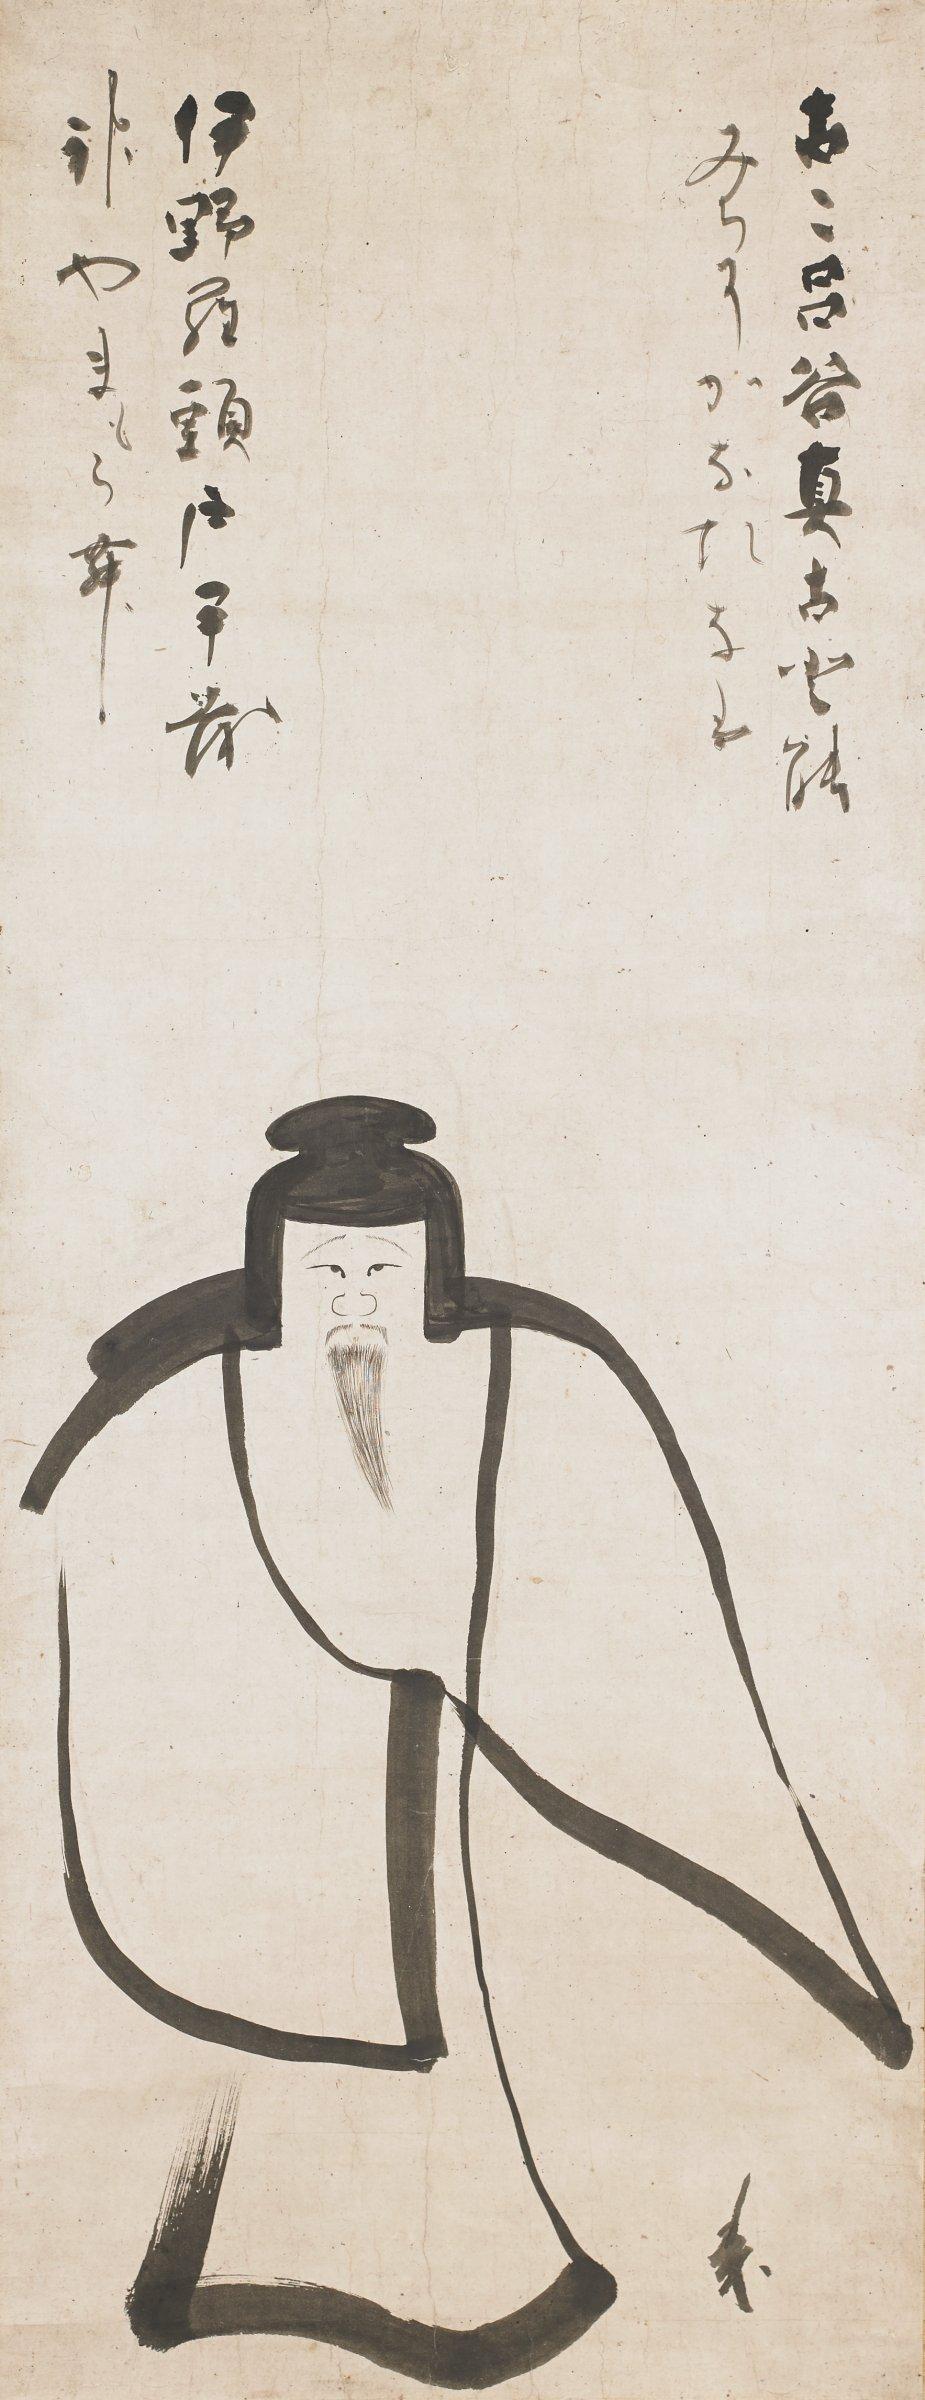 Tenjin, Konoe Nobutada, ink and color on paper